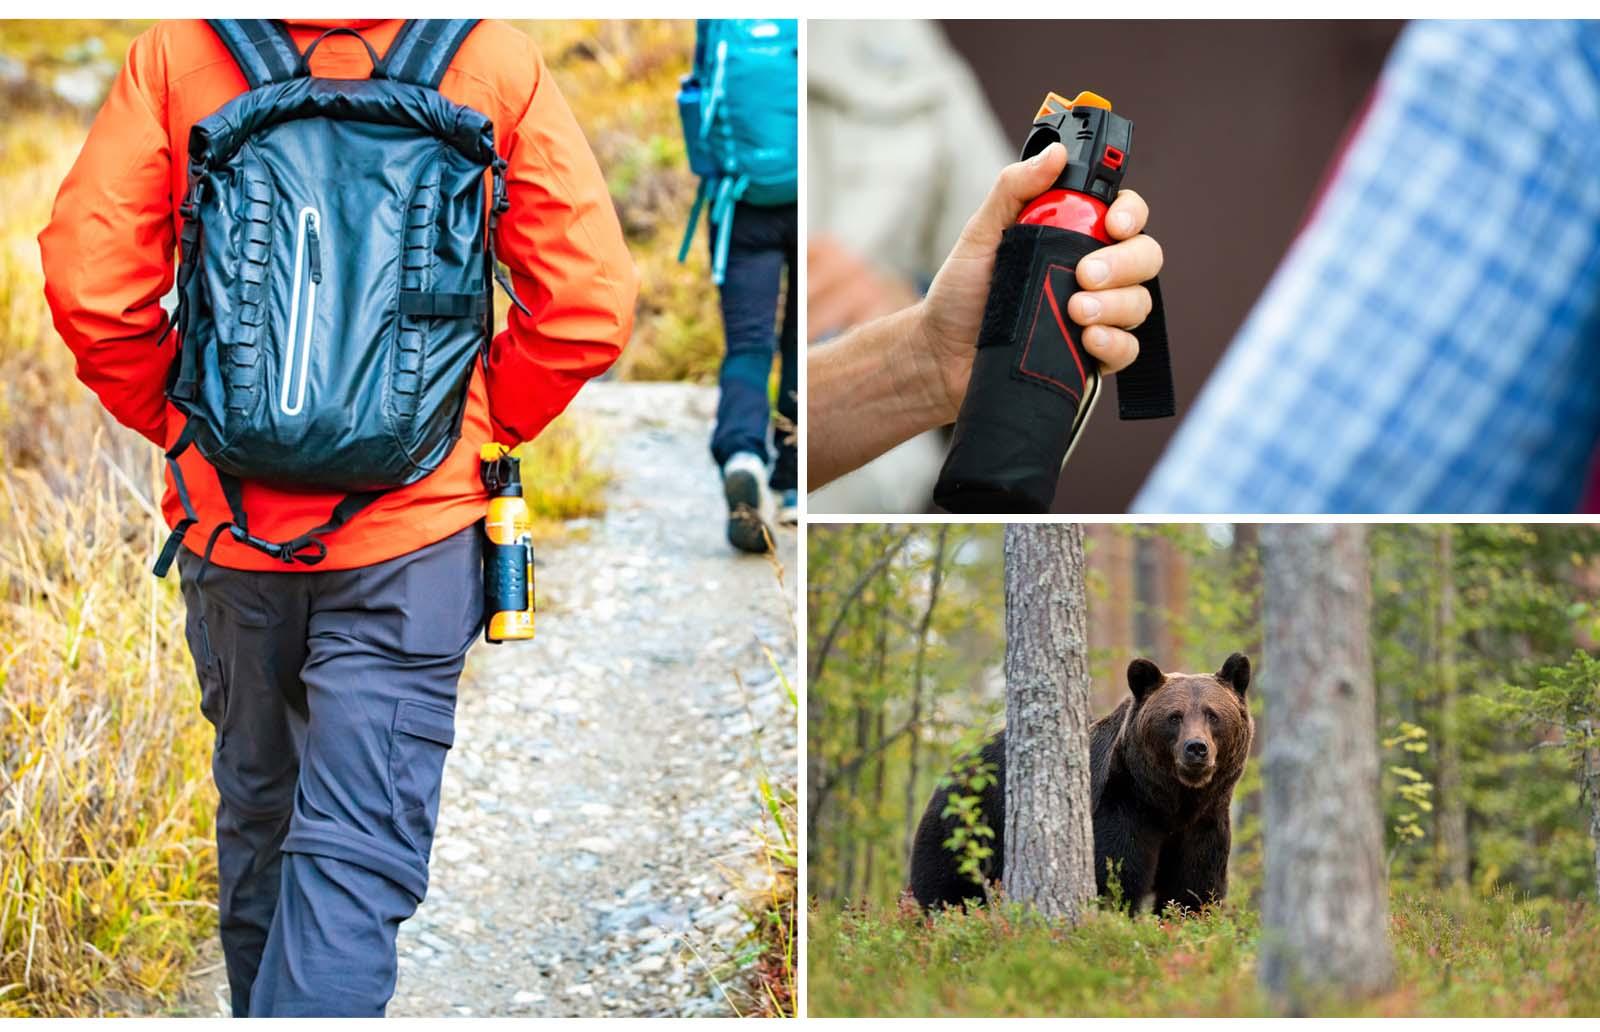 carrying bear spray